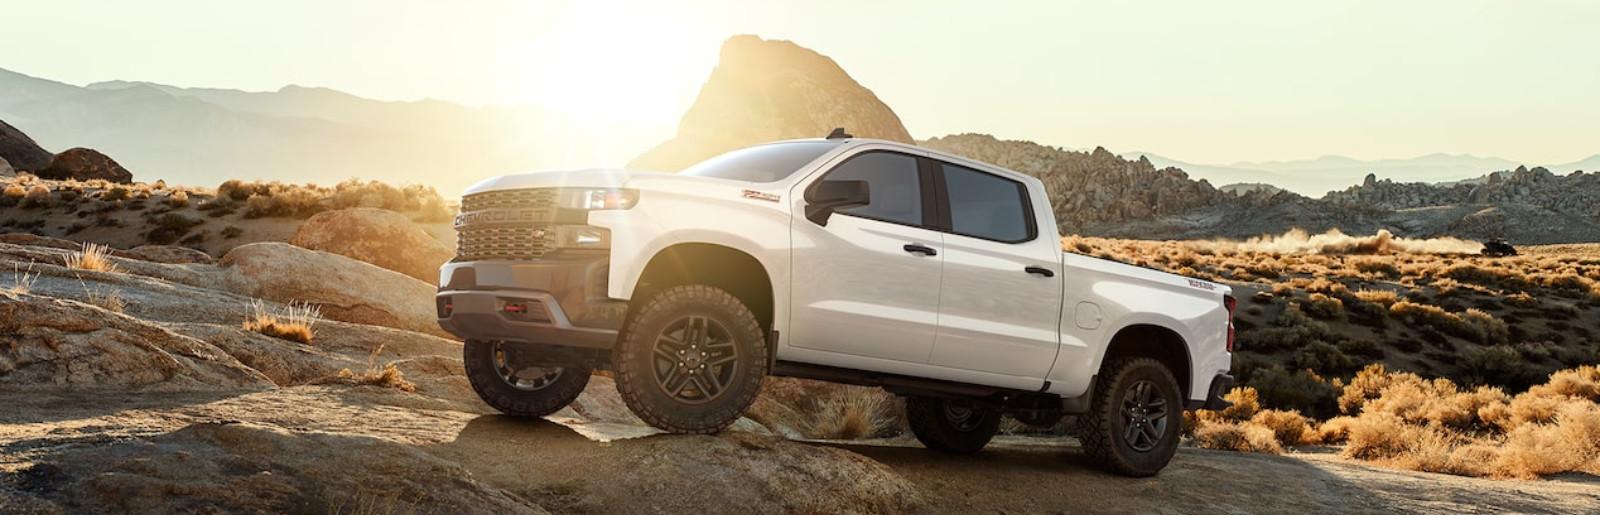 2019 Chevrolet Silverado 1500 V6 Key Features near San Diego, CA